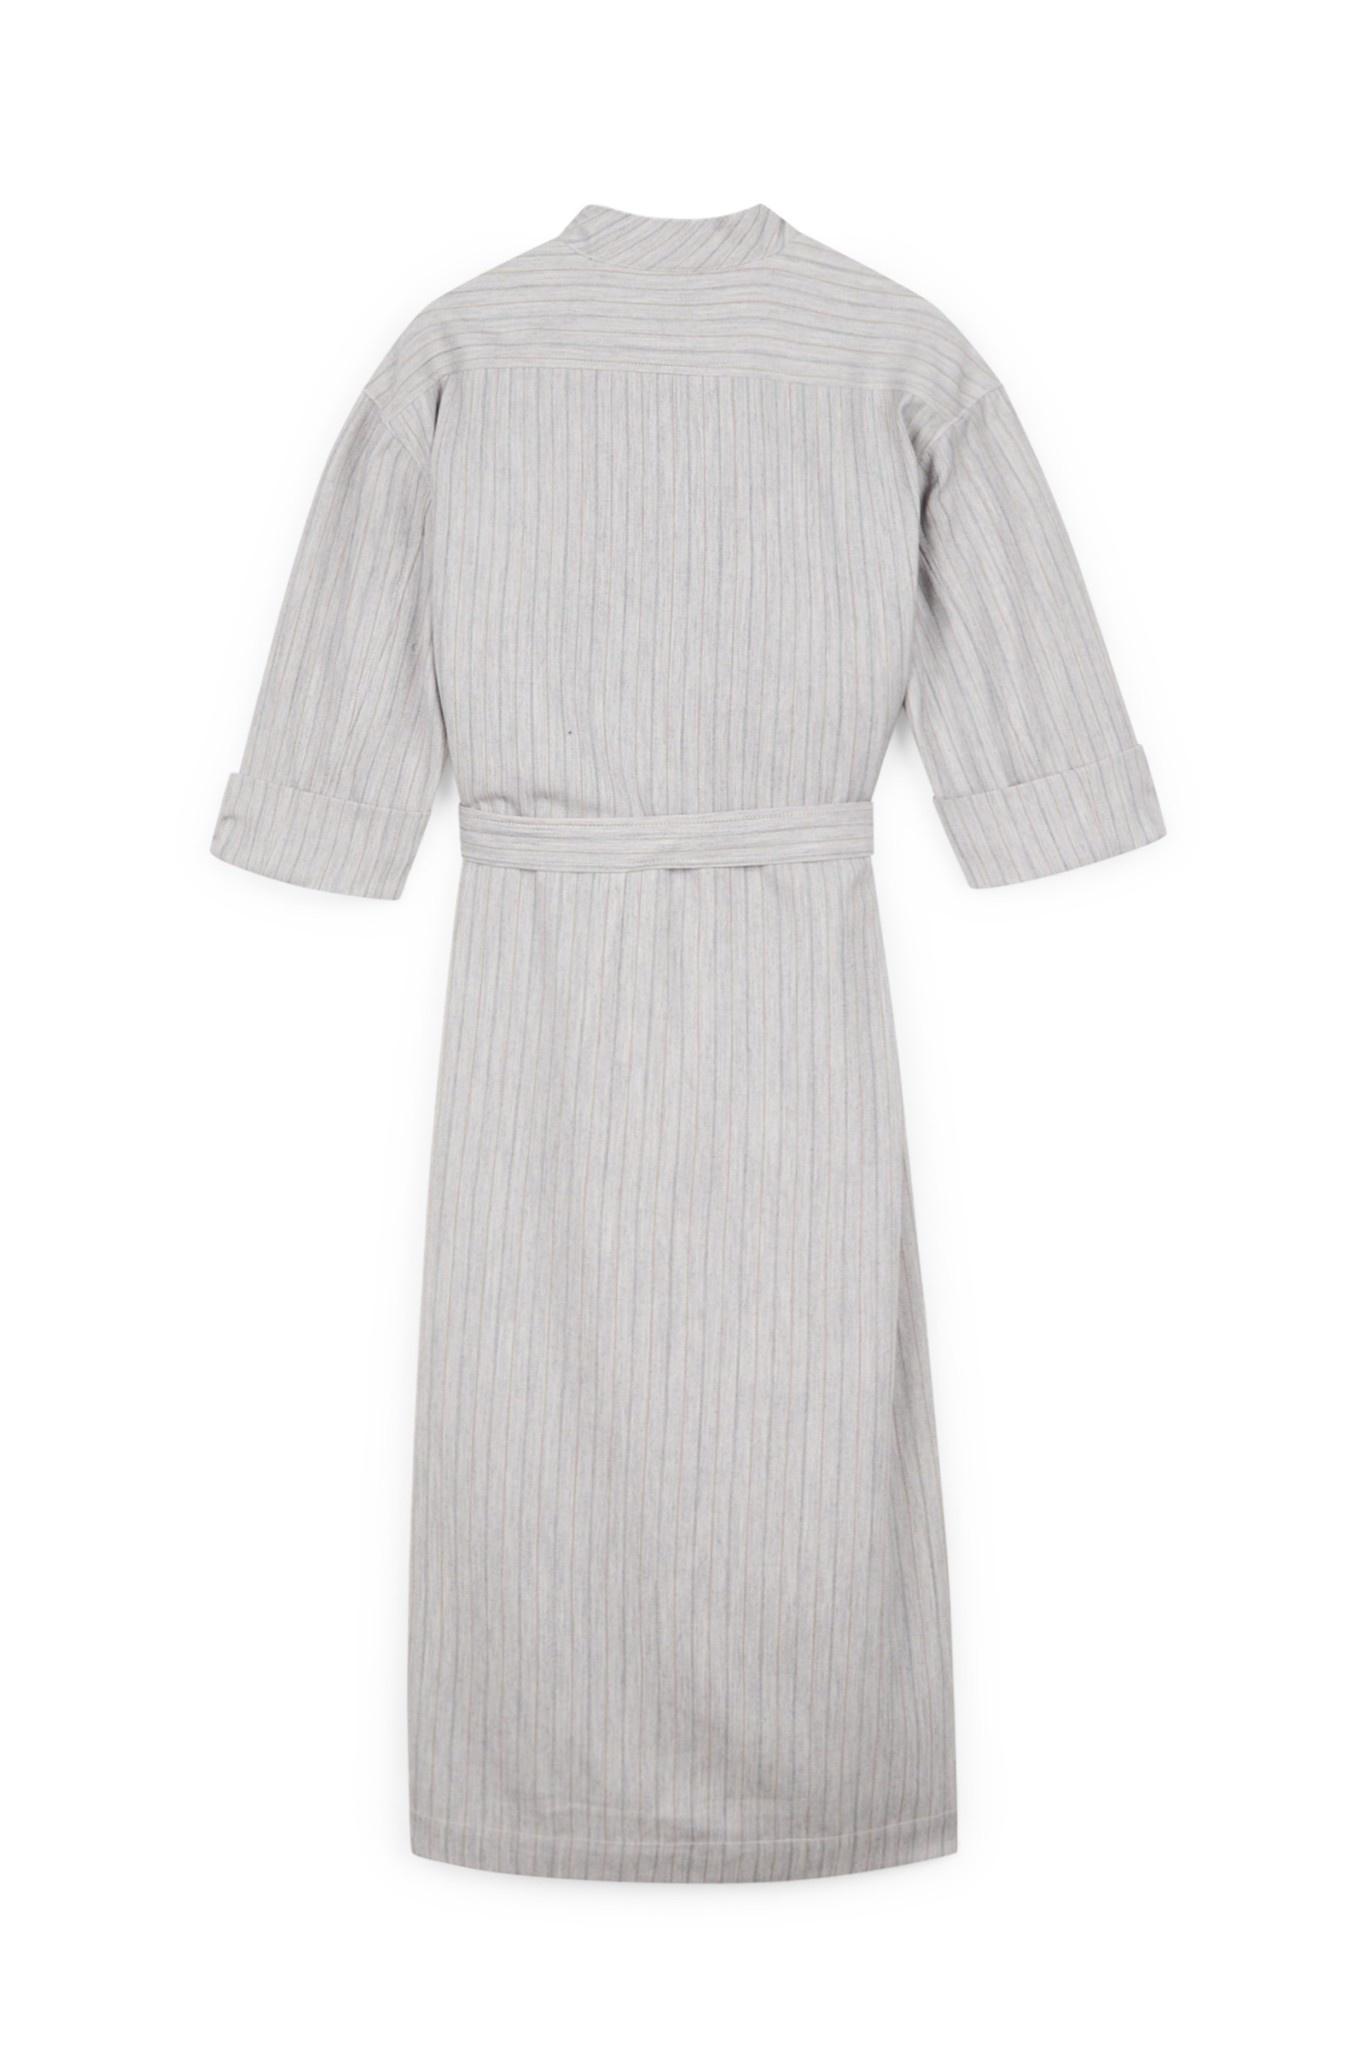 CKS Manza Dress